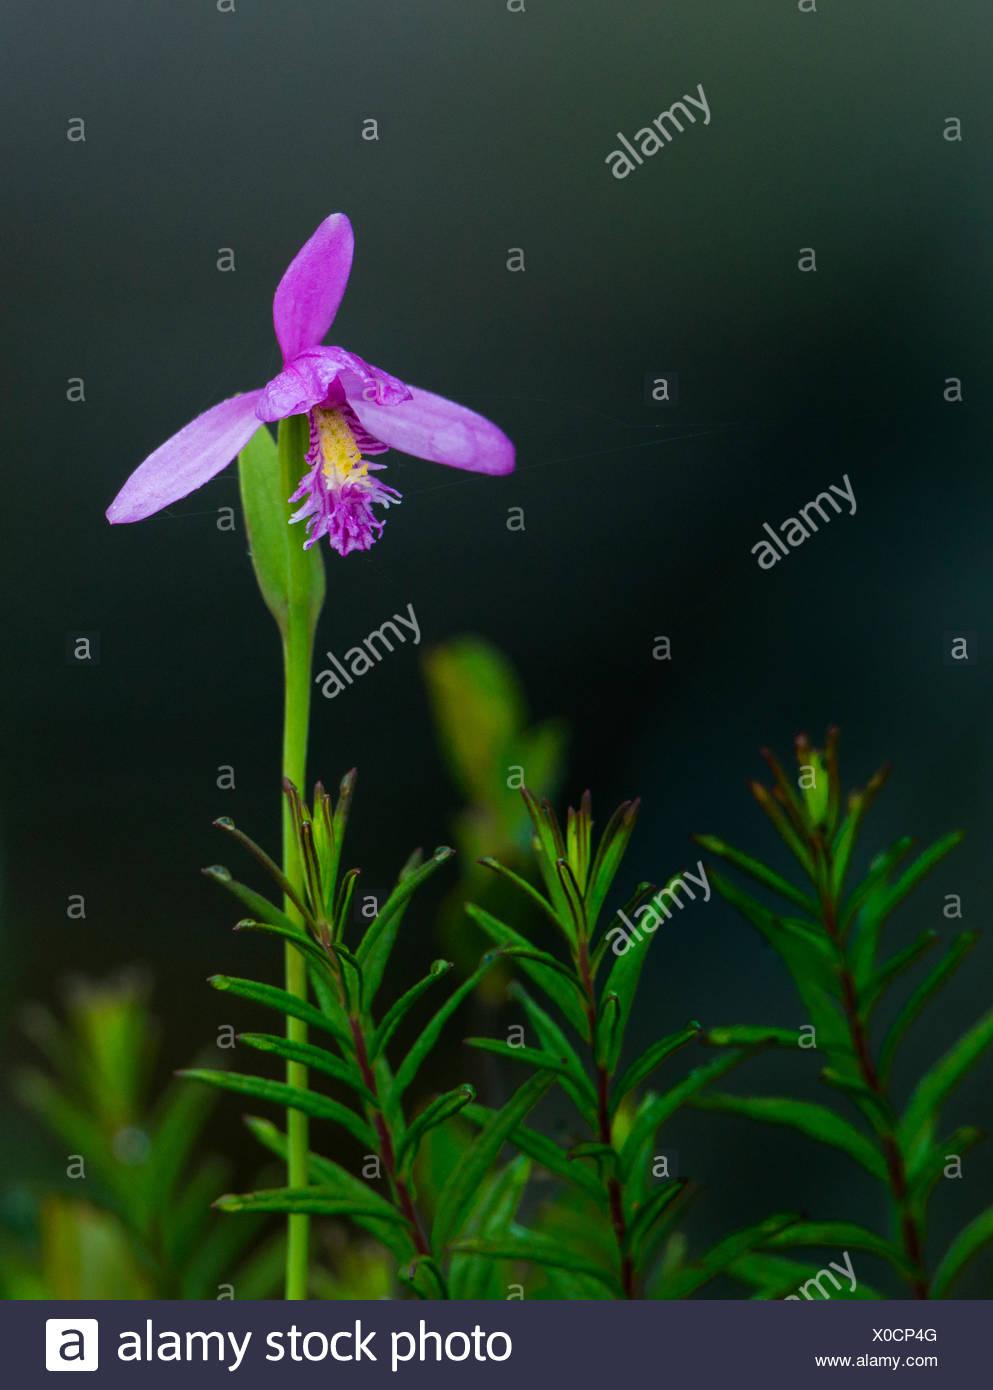 La bouche de serpent orchid, Pogonia ophioglossoides, nord-est de l'Ontario, canada Banque D'Images